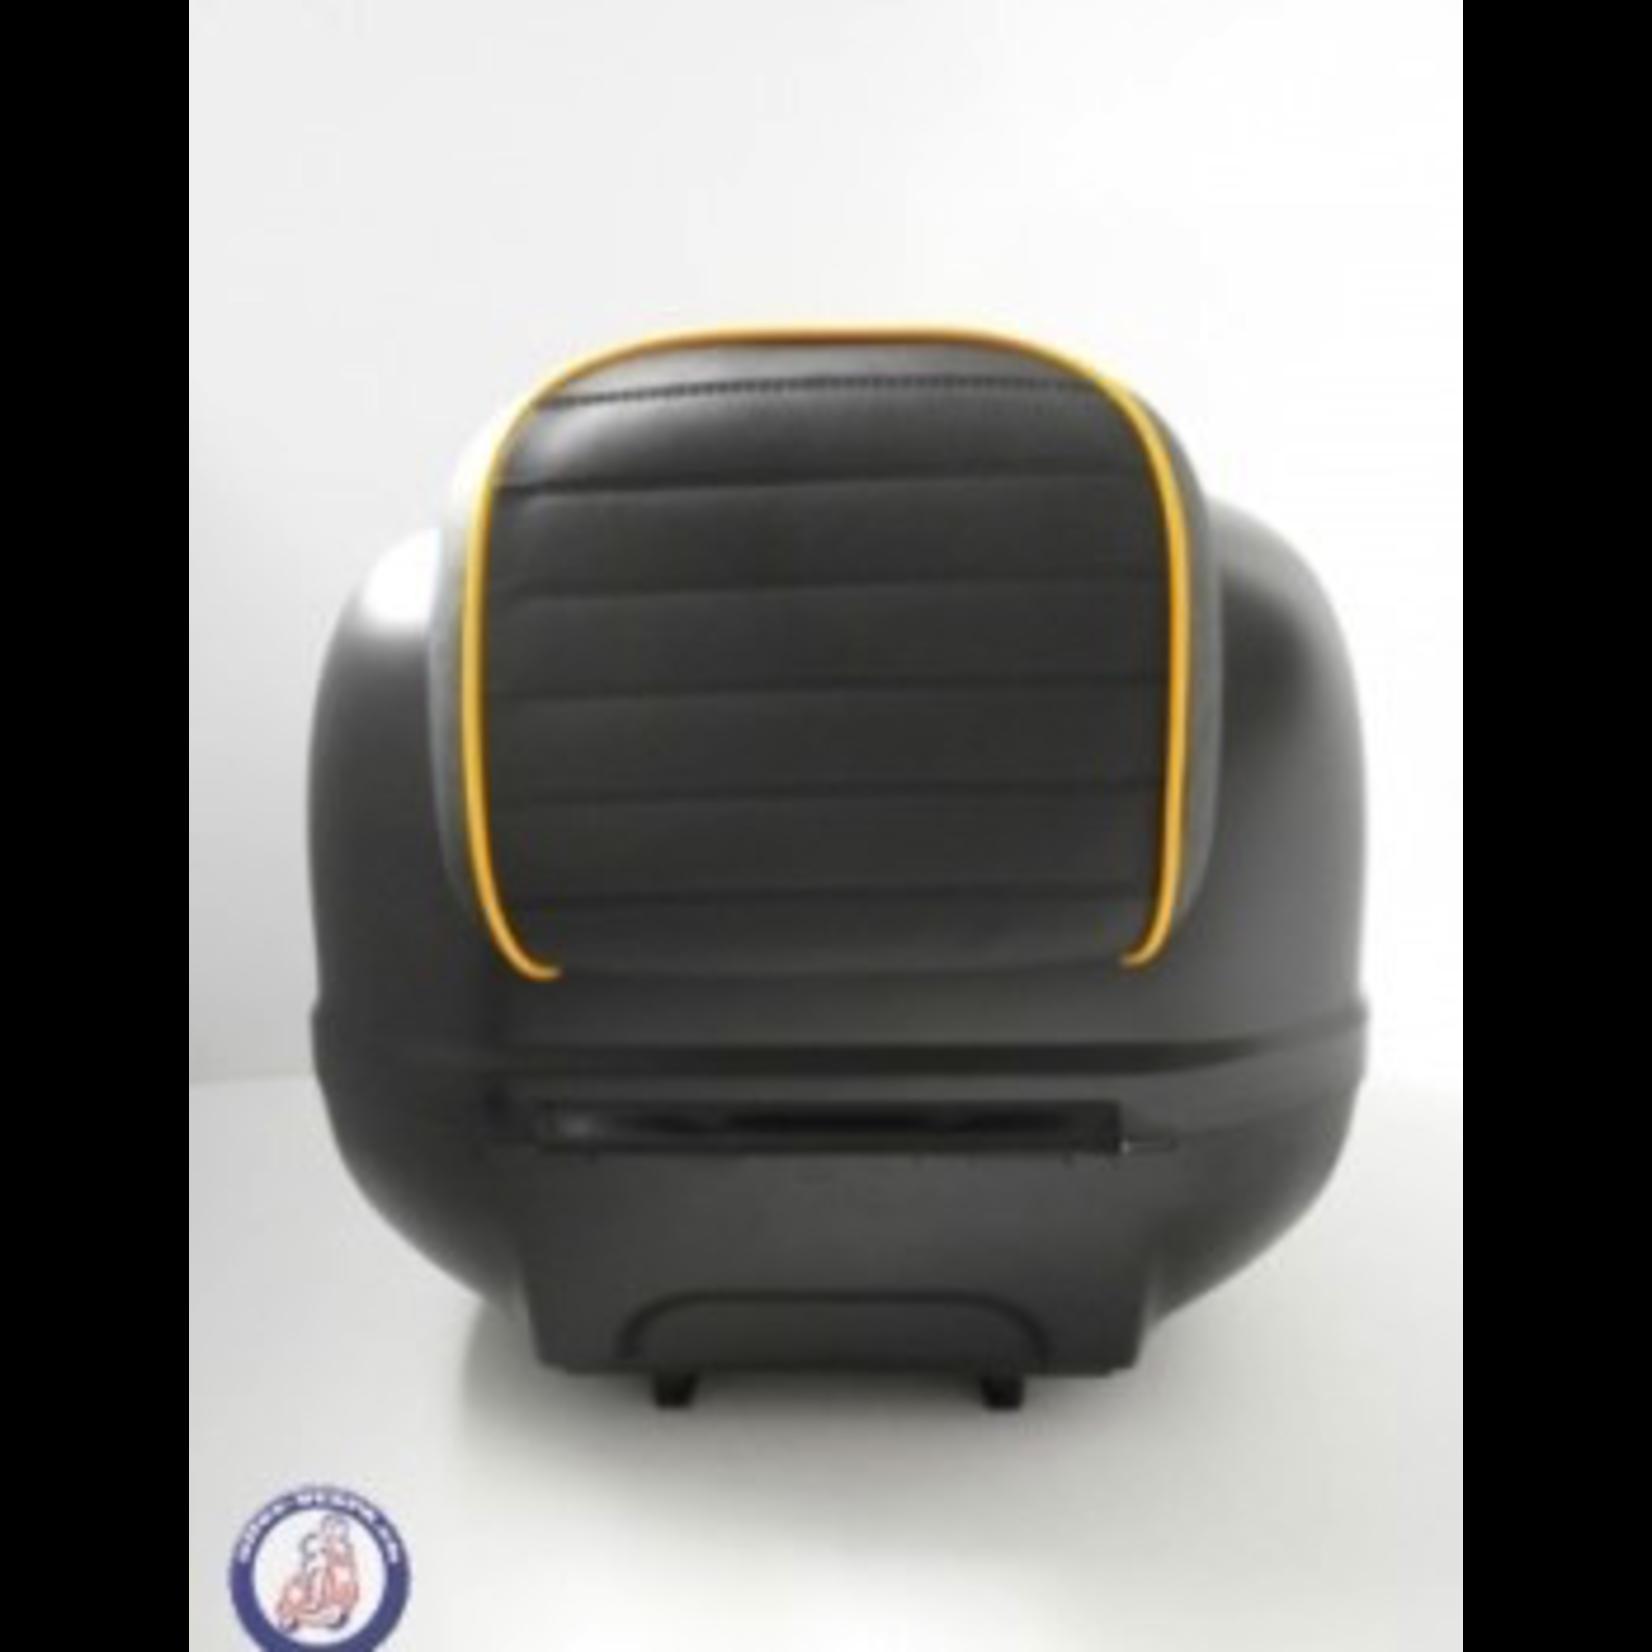 Accessories Top Case, GTS 300 Super Sport Matte Black (Orange Piping)